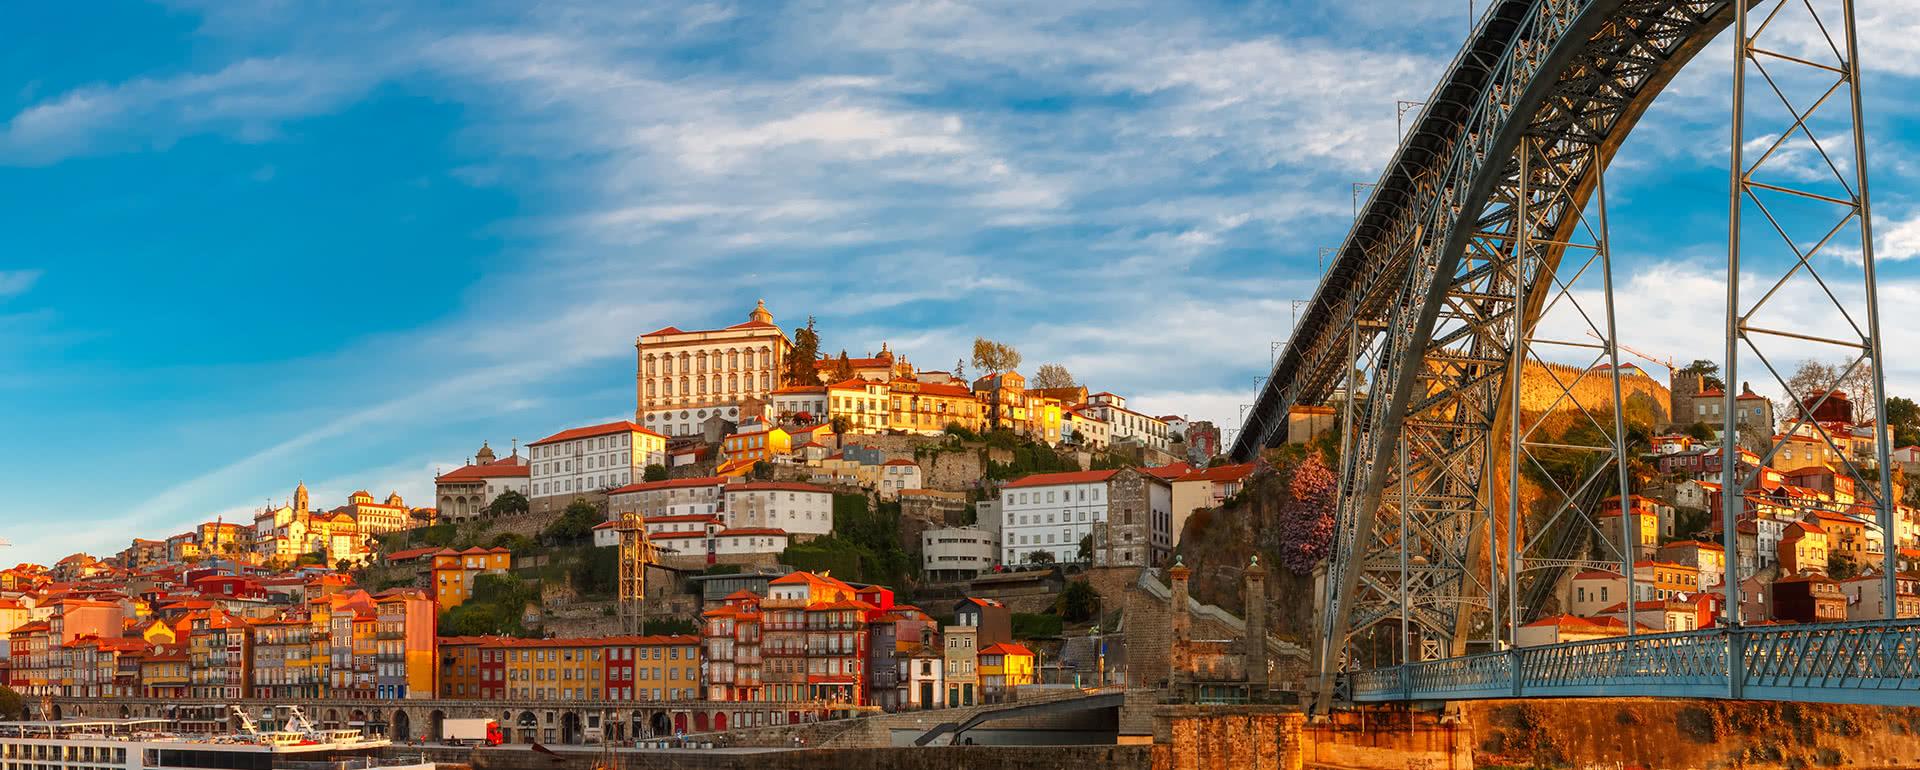 Titelbild von Porto